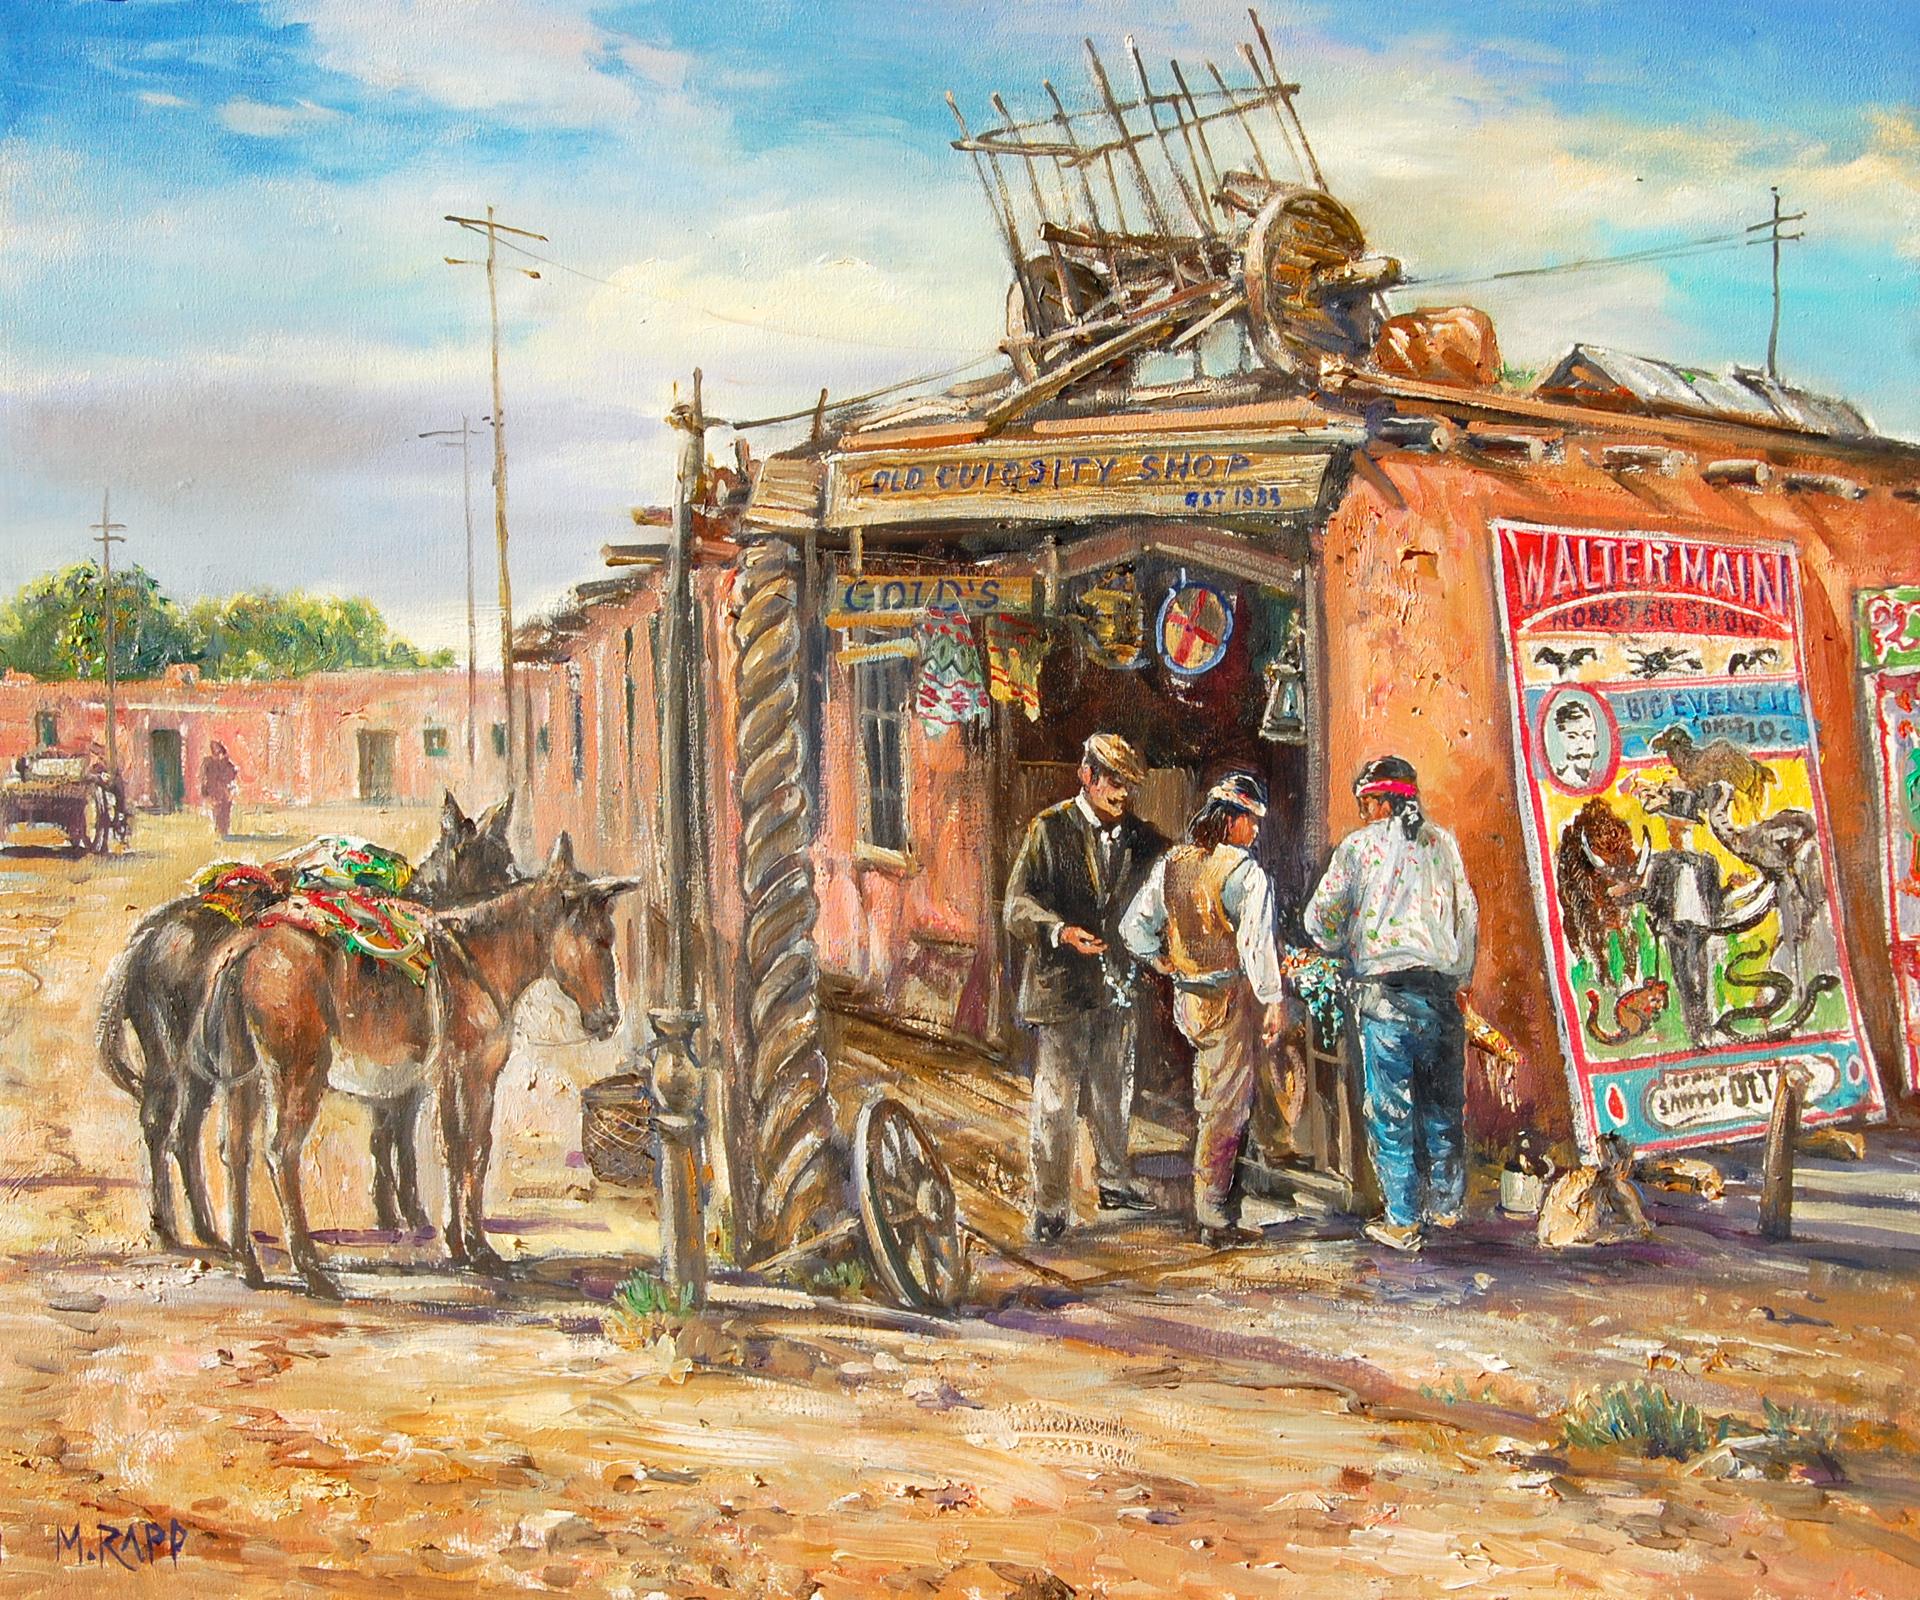 Gold's on Burro Alley, Santa Fe